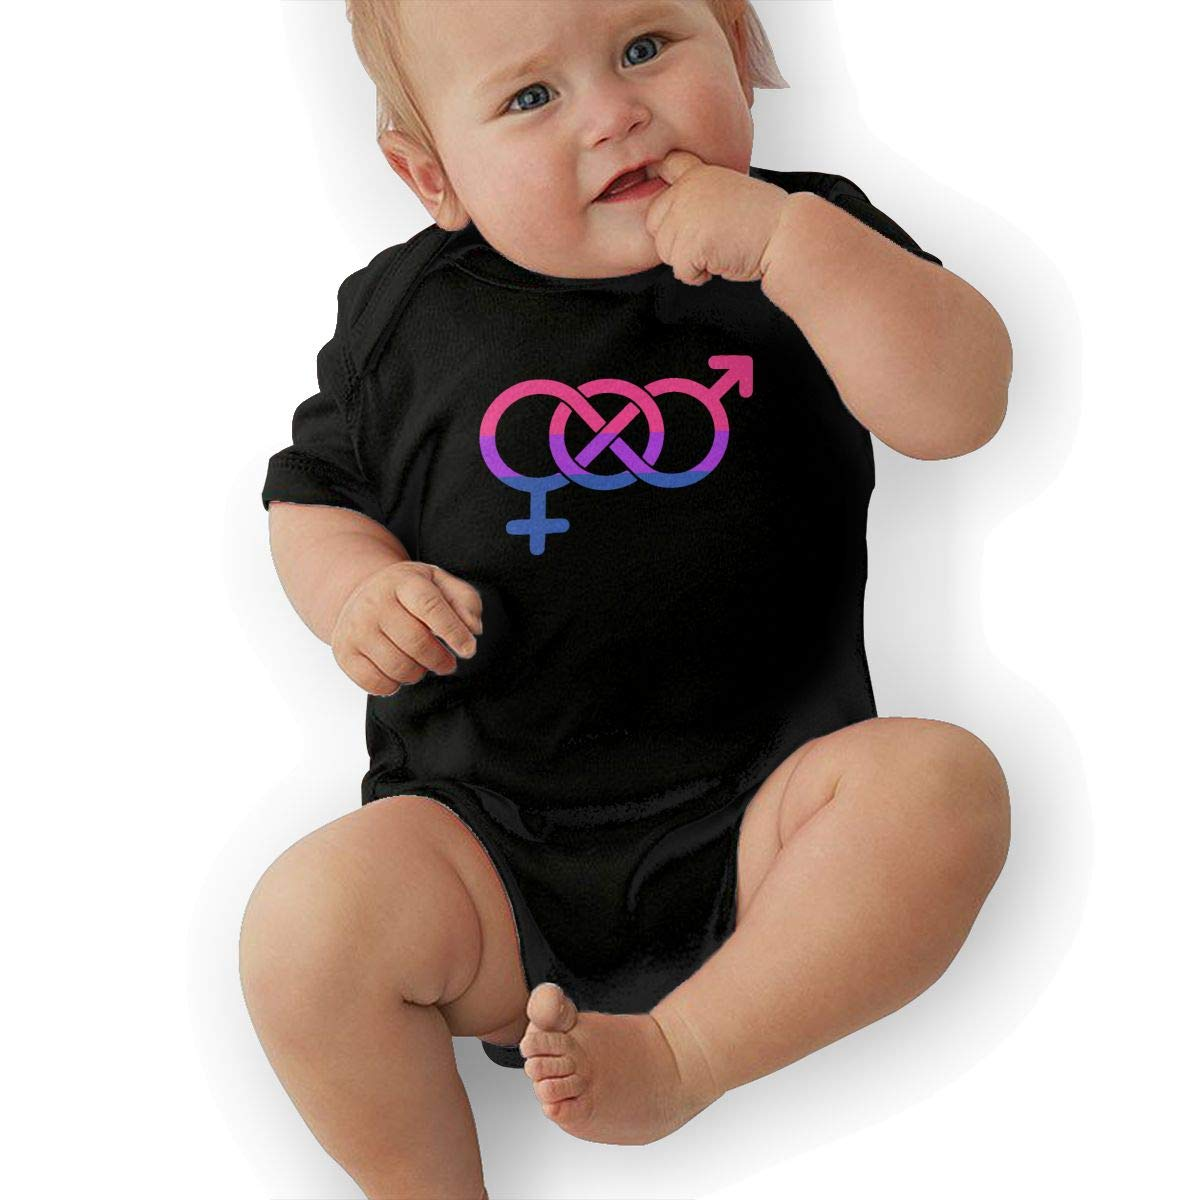 Mri-le2 Unisex Baby Short Sleeve Organic Bodysuit Bisexual Flag Symbol Toddler Jumpsuit